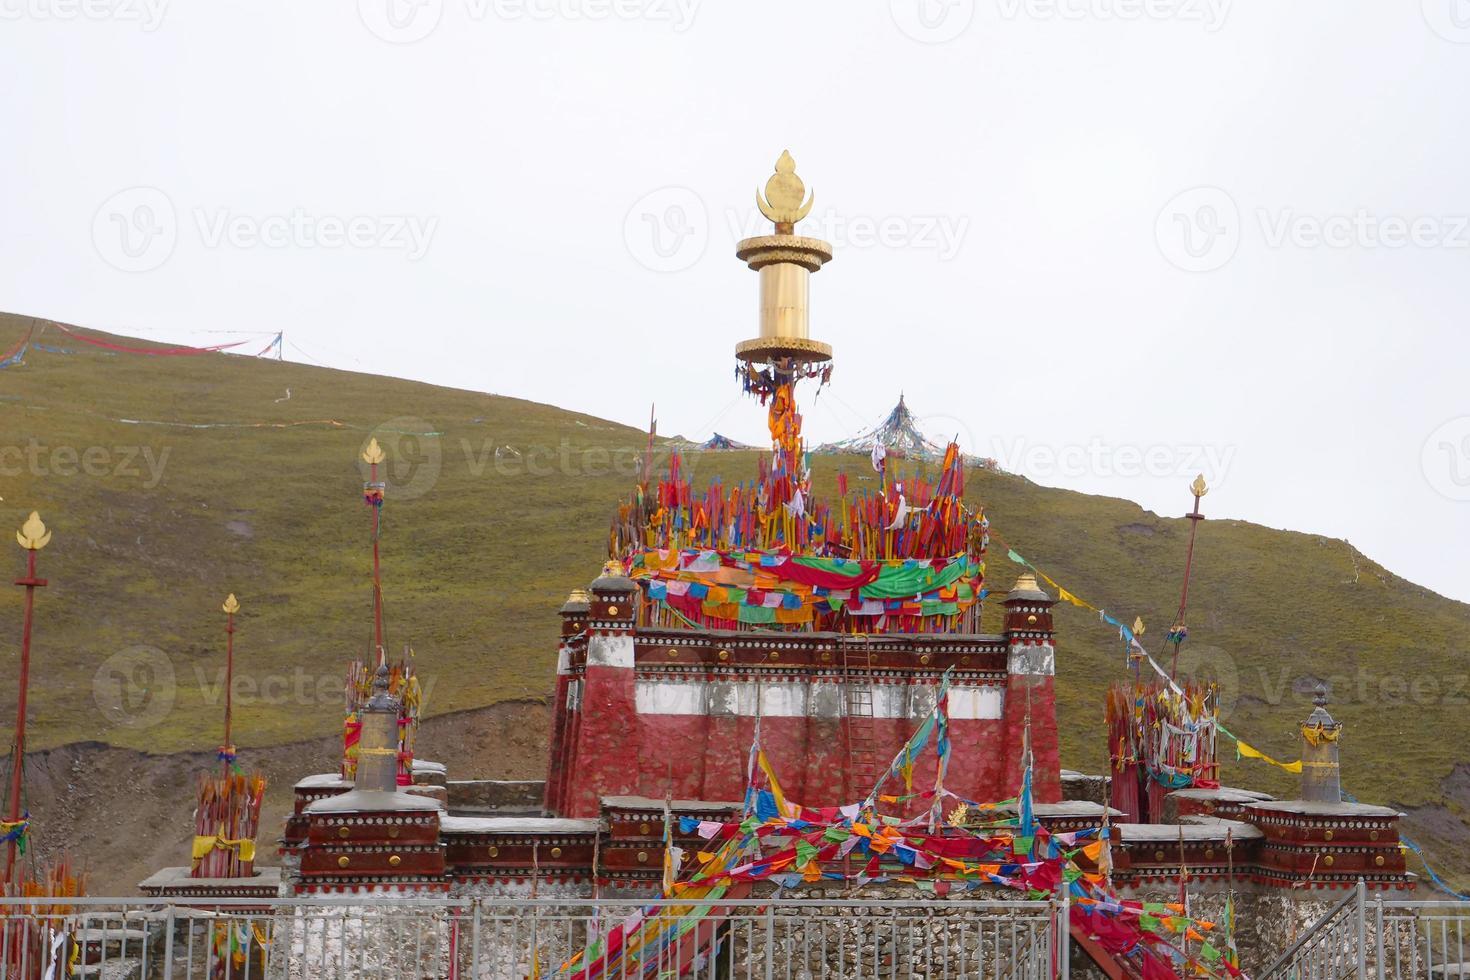 Tibetan Buddhist temple in Laji Shan Qinghai Province China photo